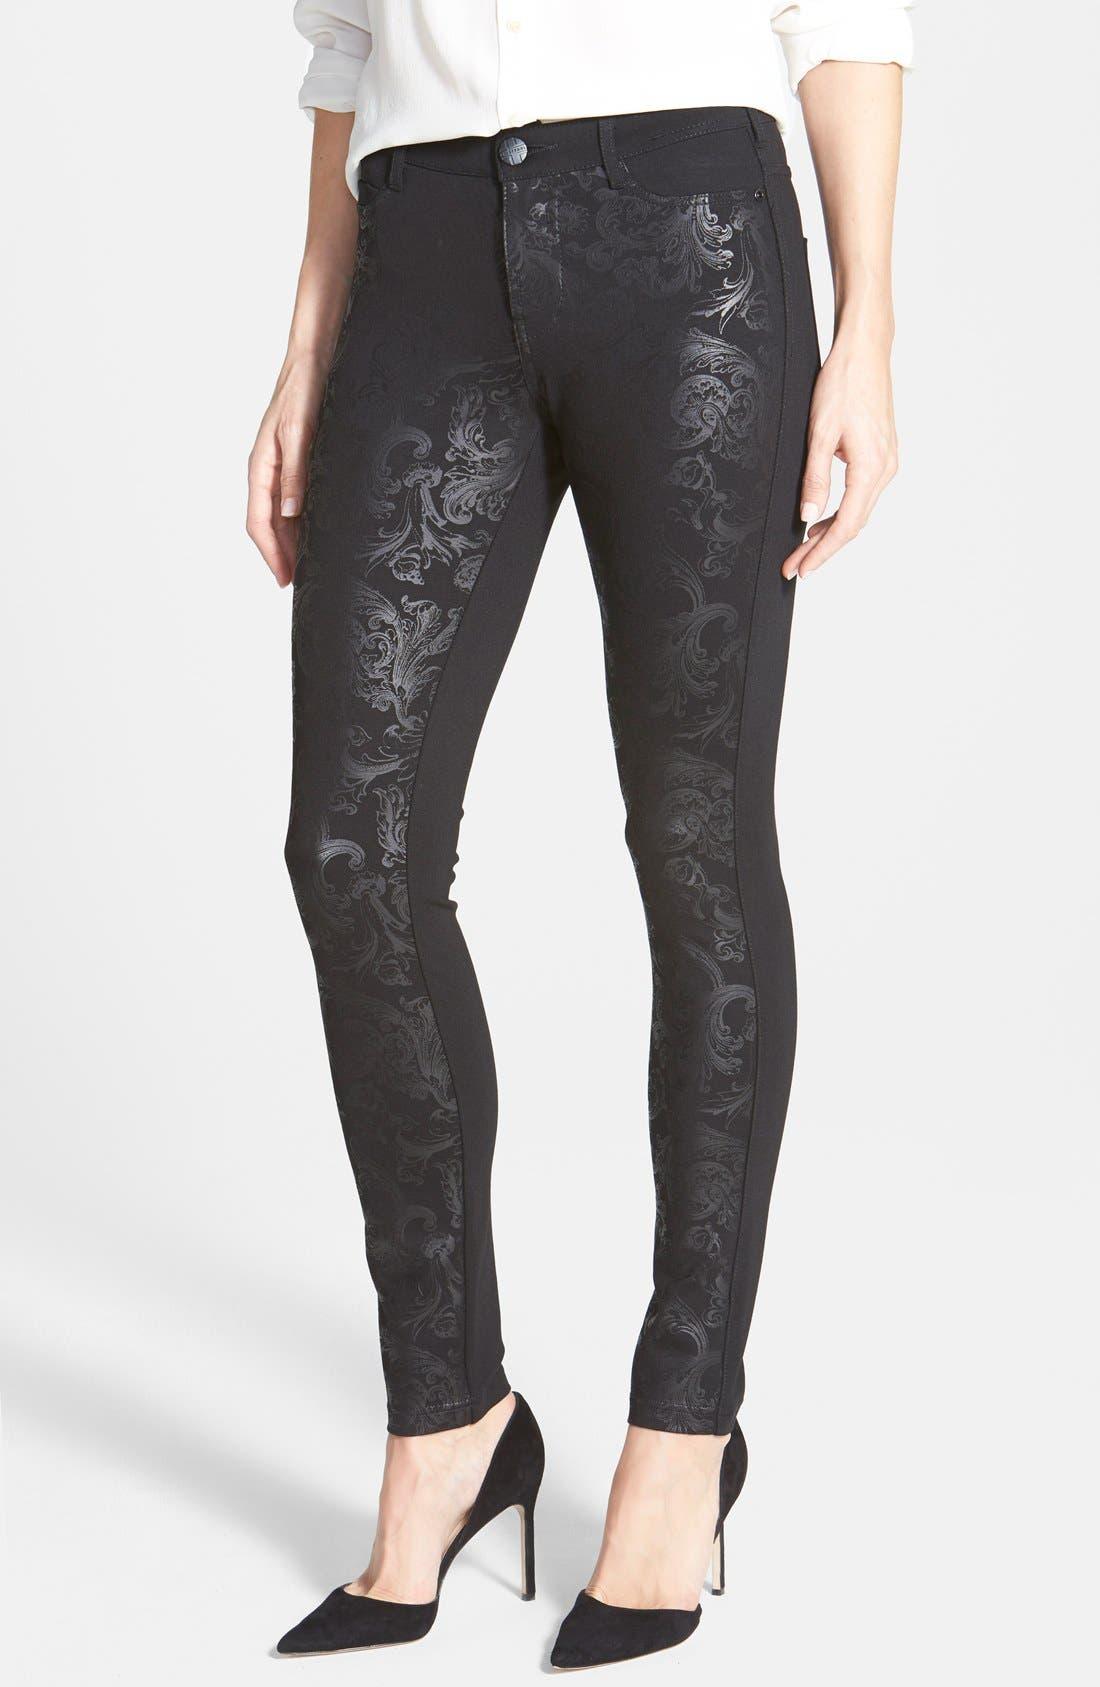 Main Image - Liverpool Jeans Company 'Madonna' Gloss Print Stretch Knit Skinny Pants